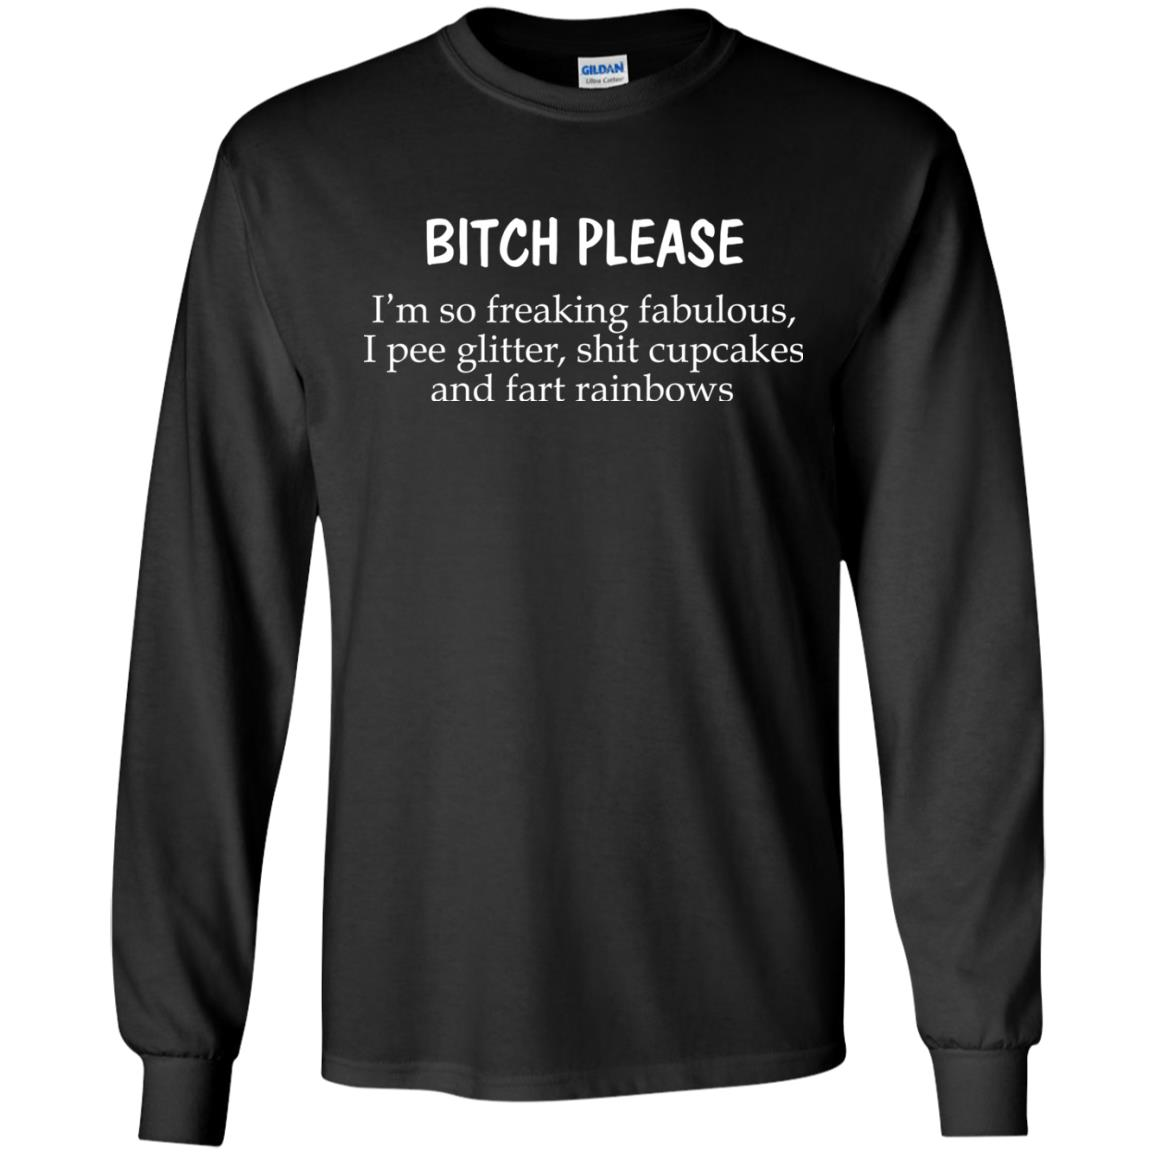 image 1244 - Bitch Please I'm so freaking fabulous t-shirt, sweater